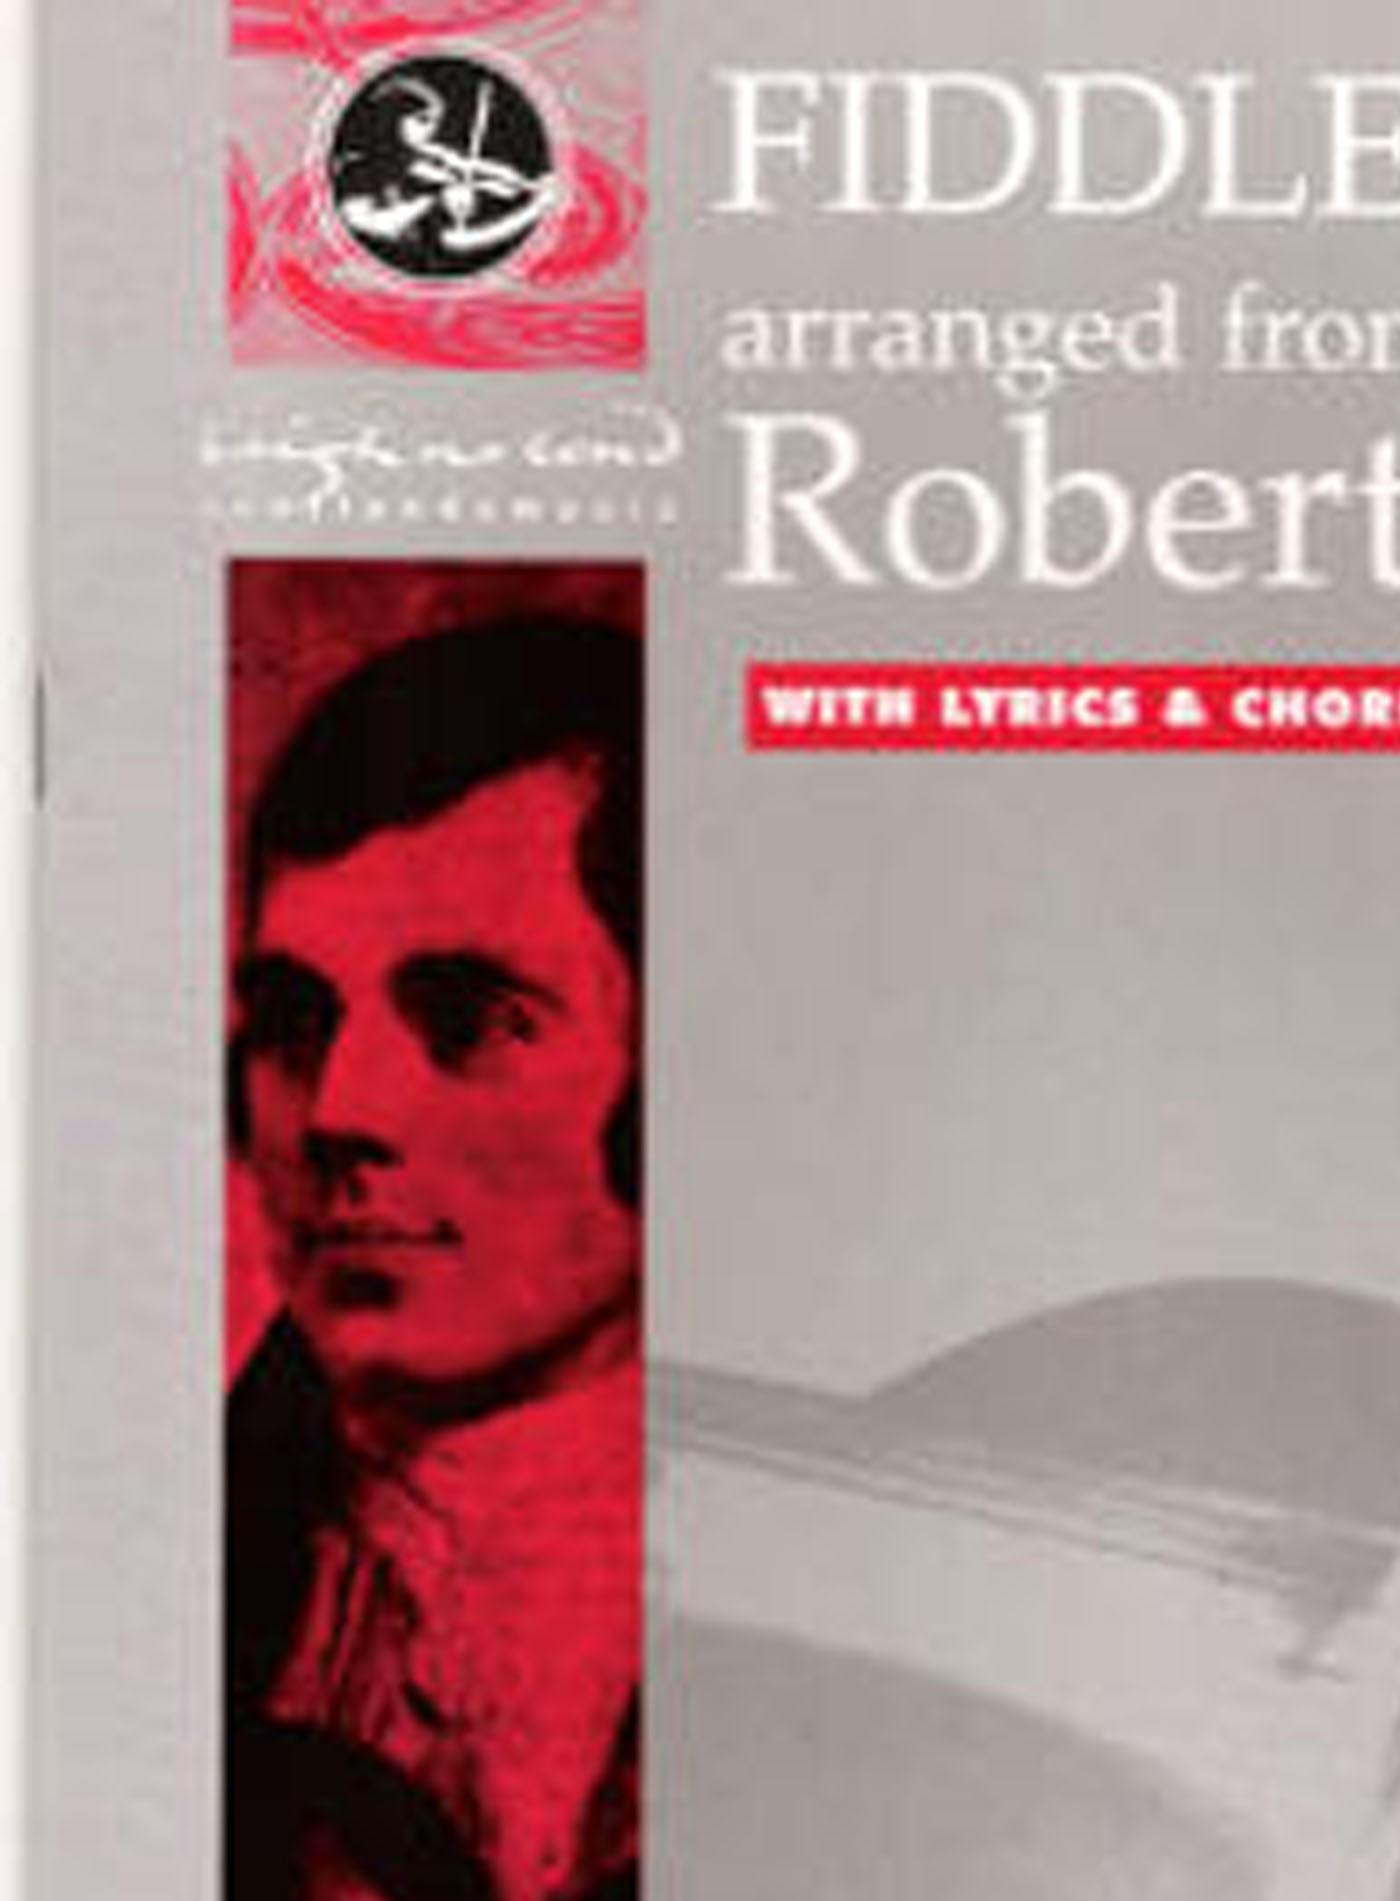 Fiddle Duets Robert Burns Songs Book & CD ScottIsh Violin Lyrics Chords S157